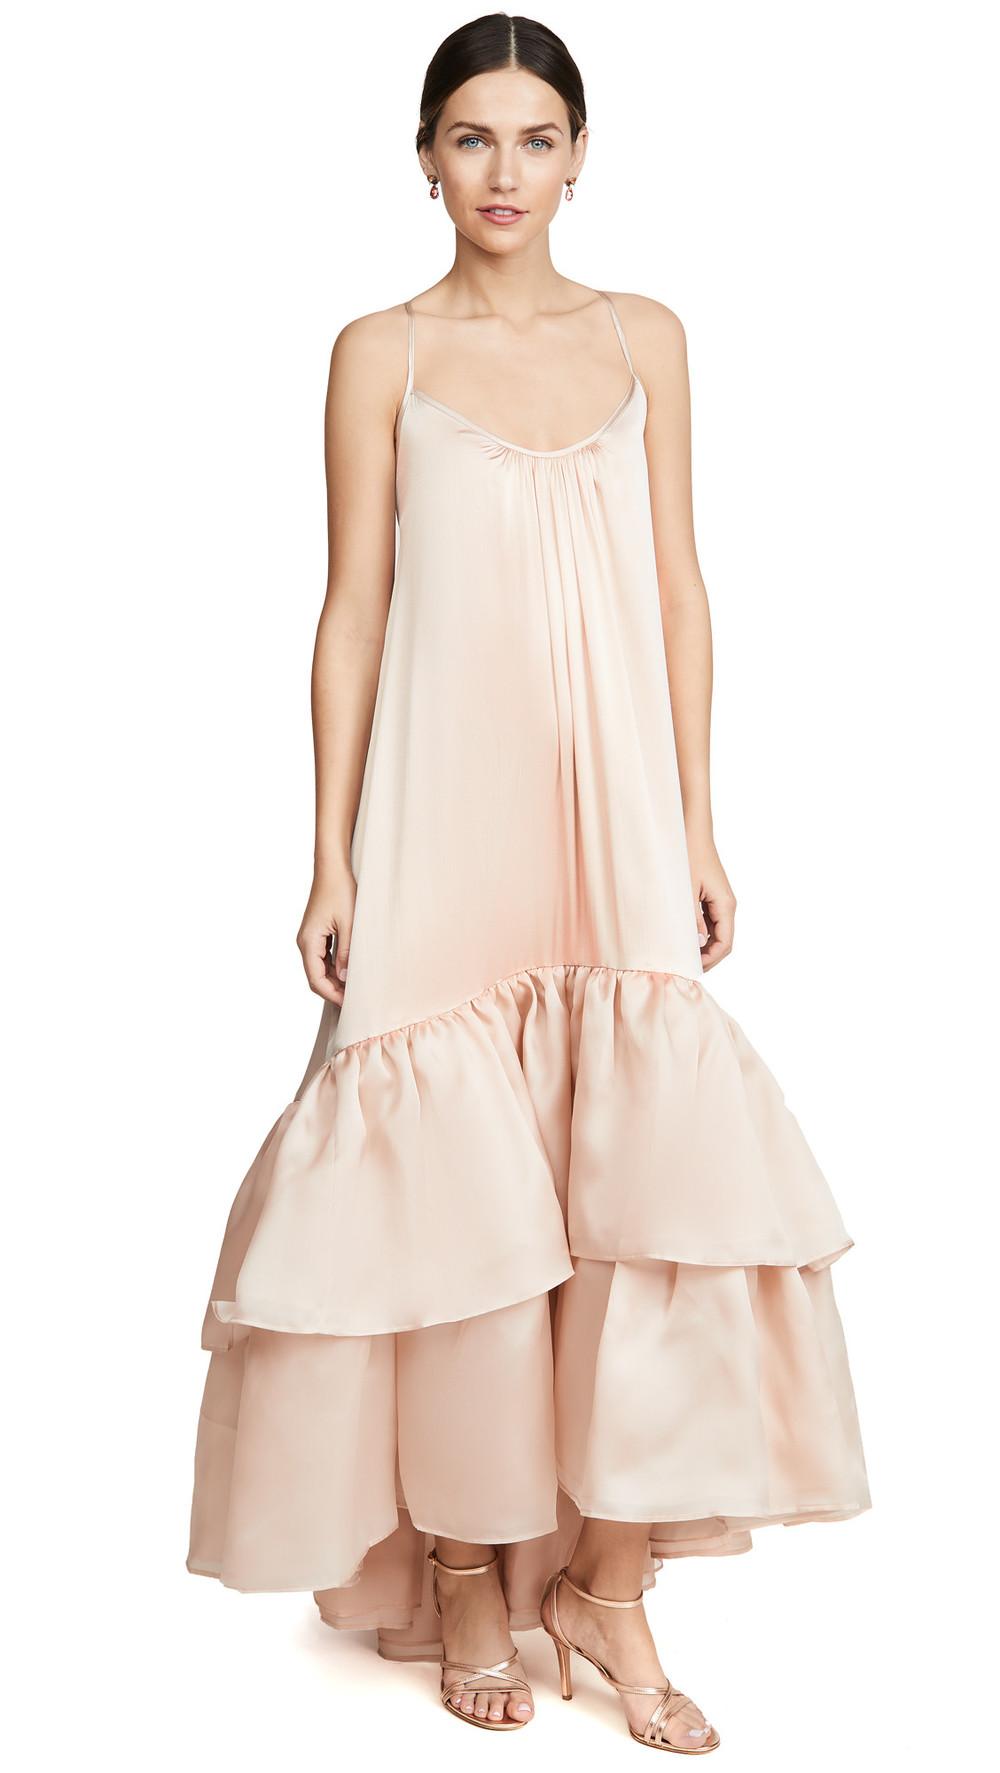 Silvia Tcherassi Angelique Dress in rose